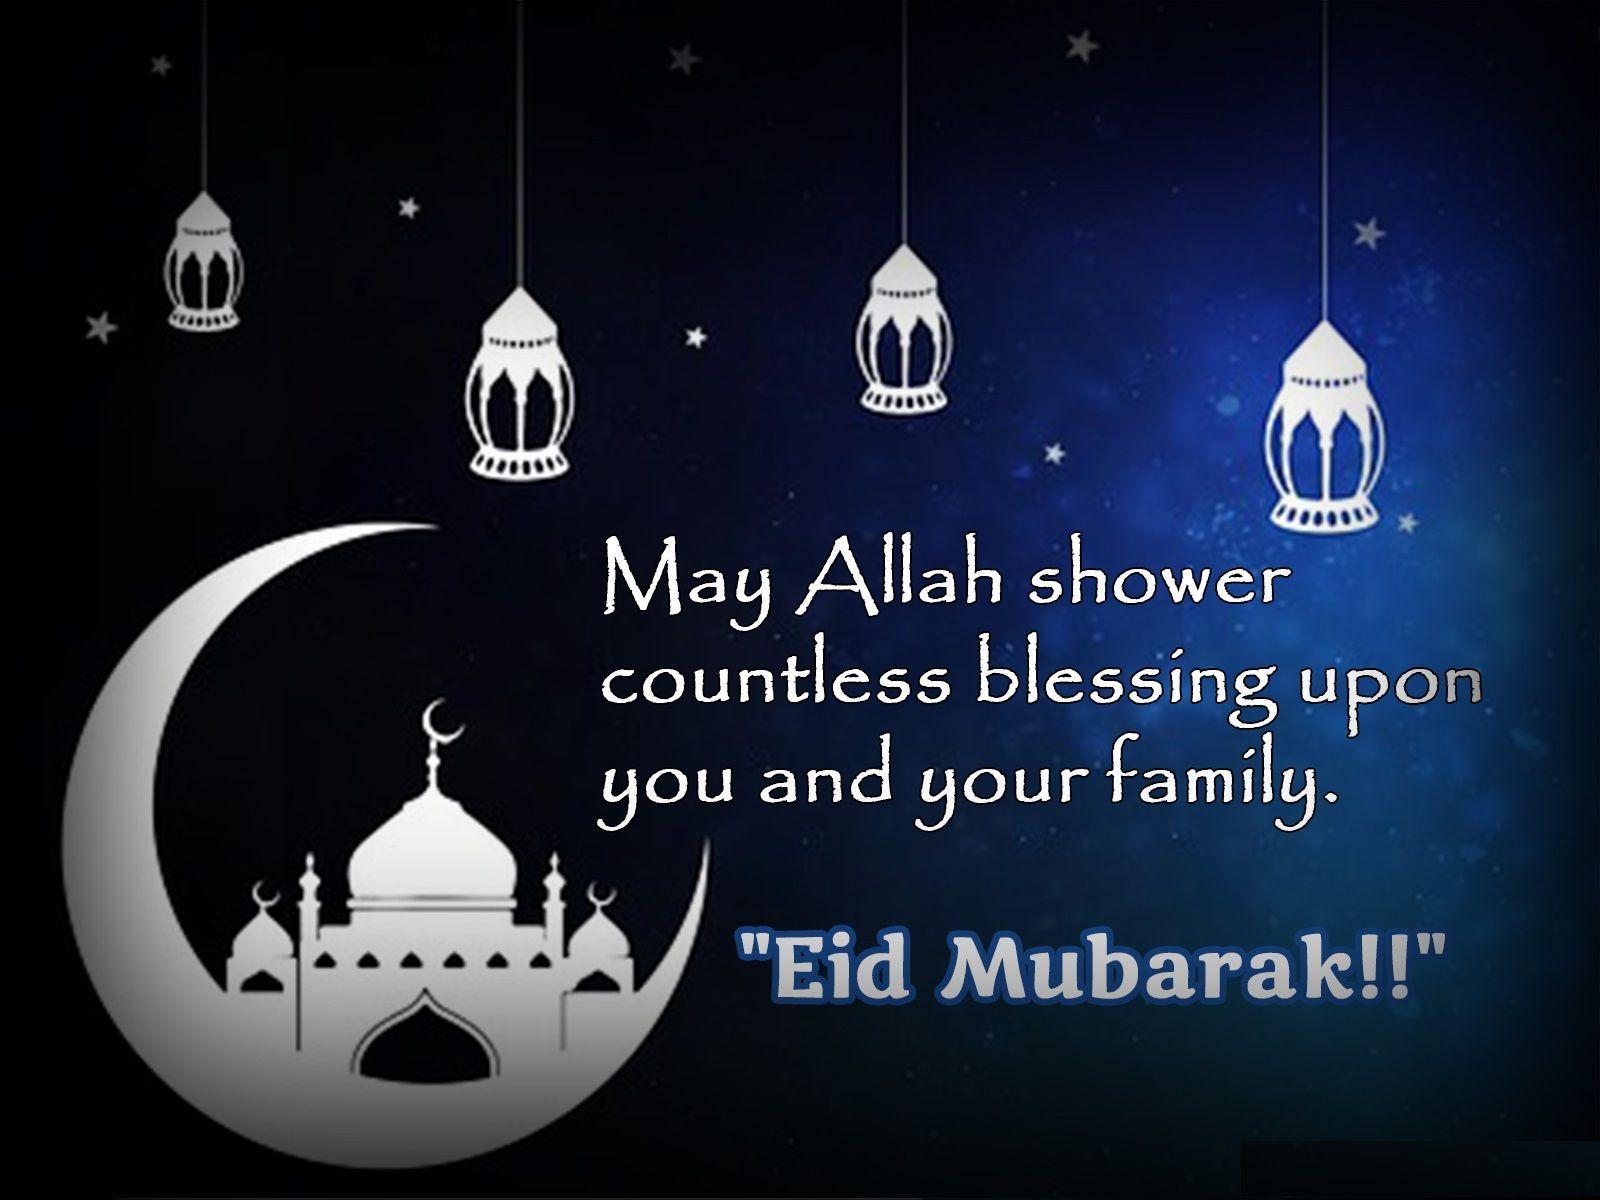 Eid Ul Adha Pictures And Cards Eid Mubarak Wishes Eid Ul Adha